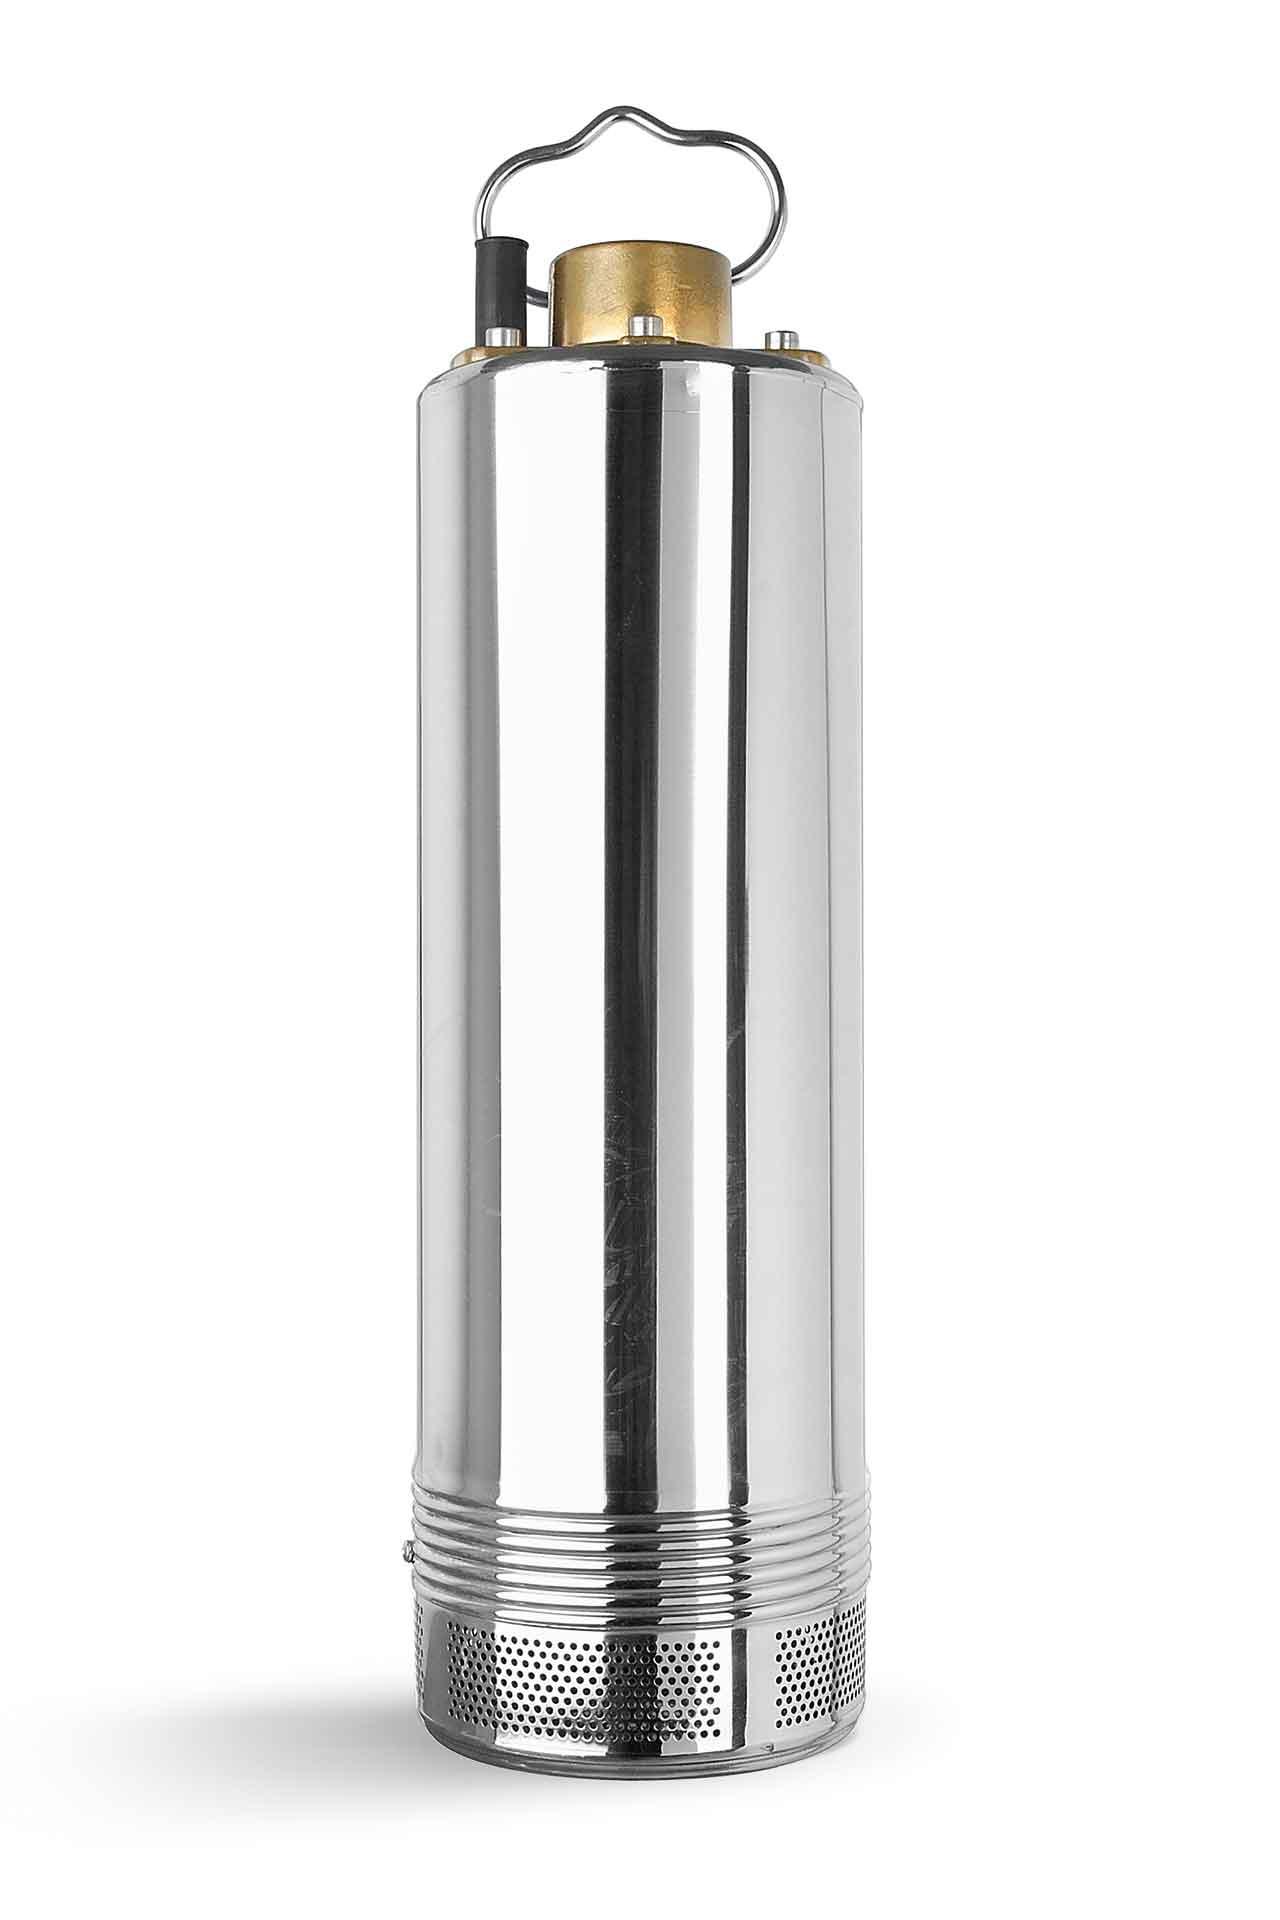 Pompe submersibile SRM-SRT seria /140; Qmax = 8,4 m3/h; Hmax = 57 m